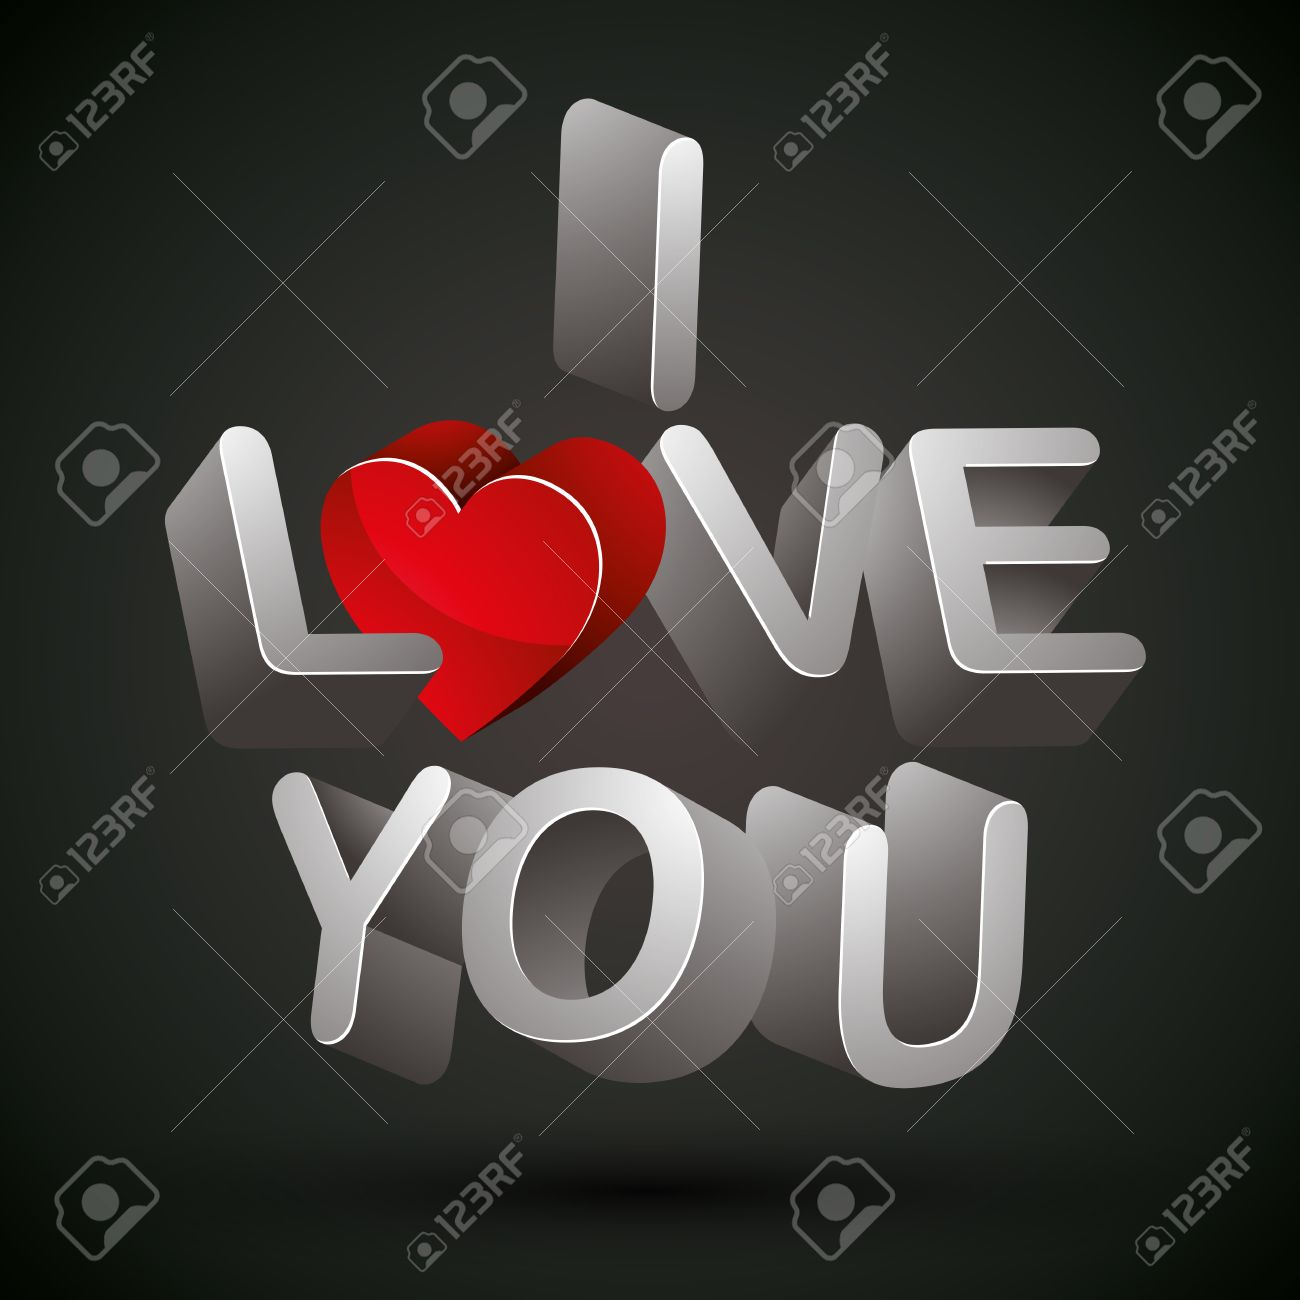 Imagenes de te amo en fondo negro